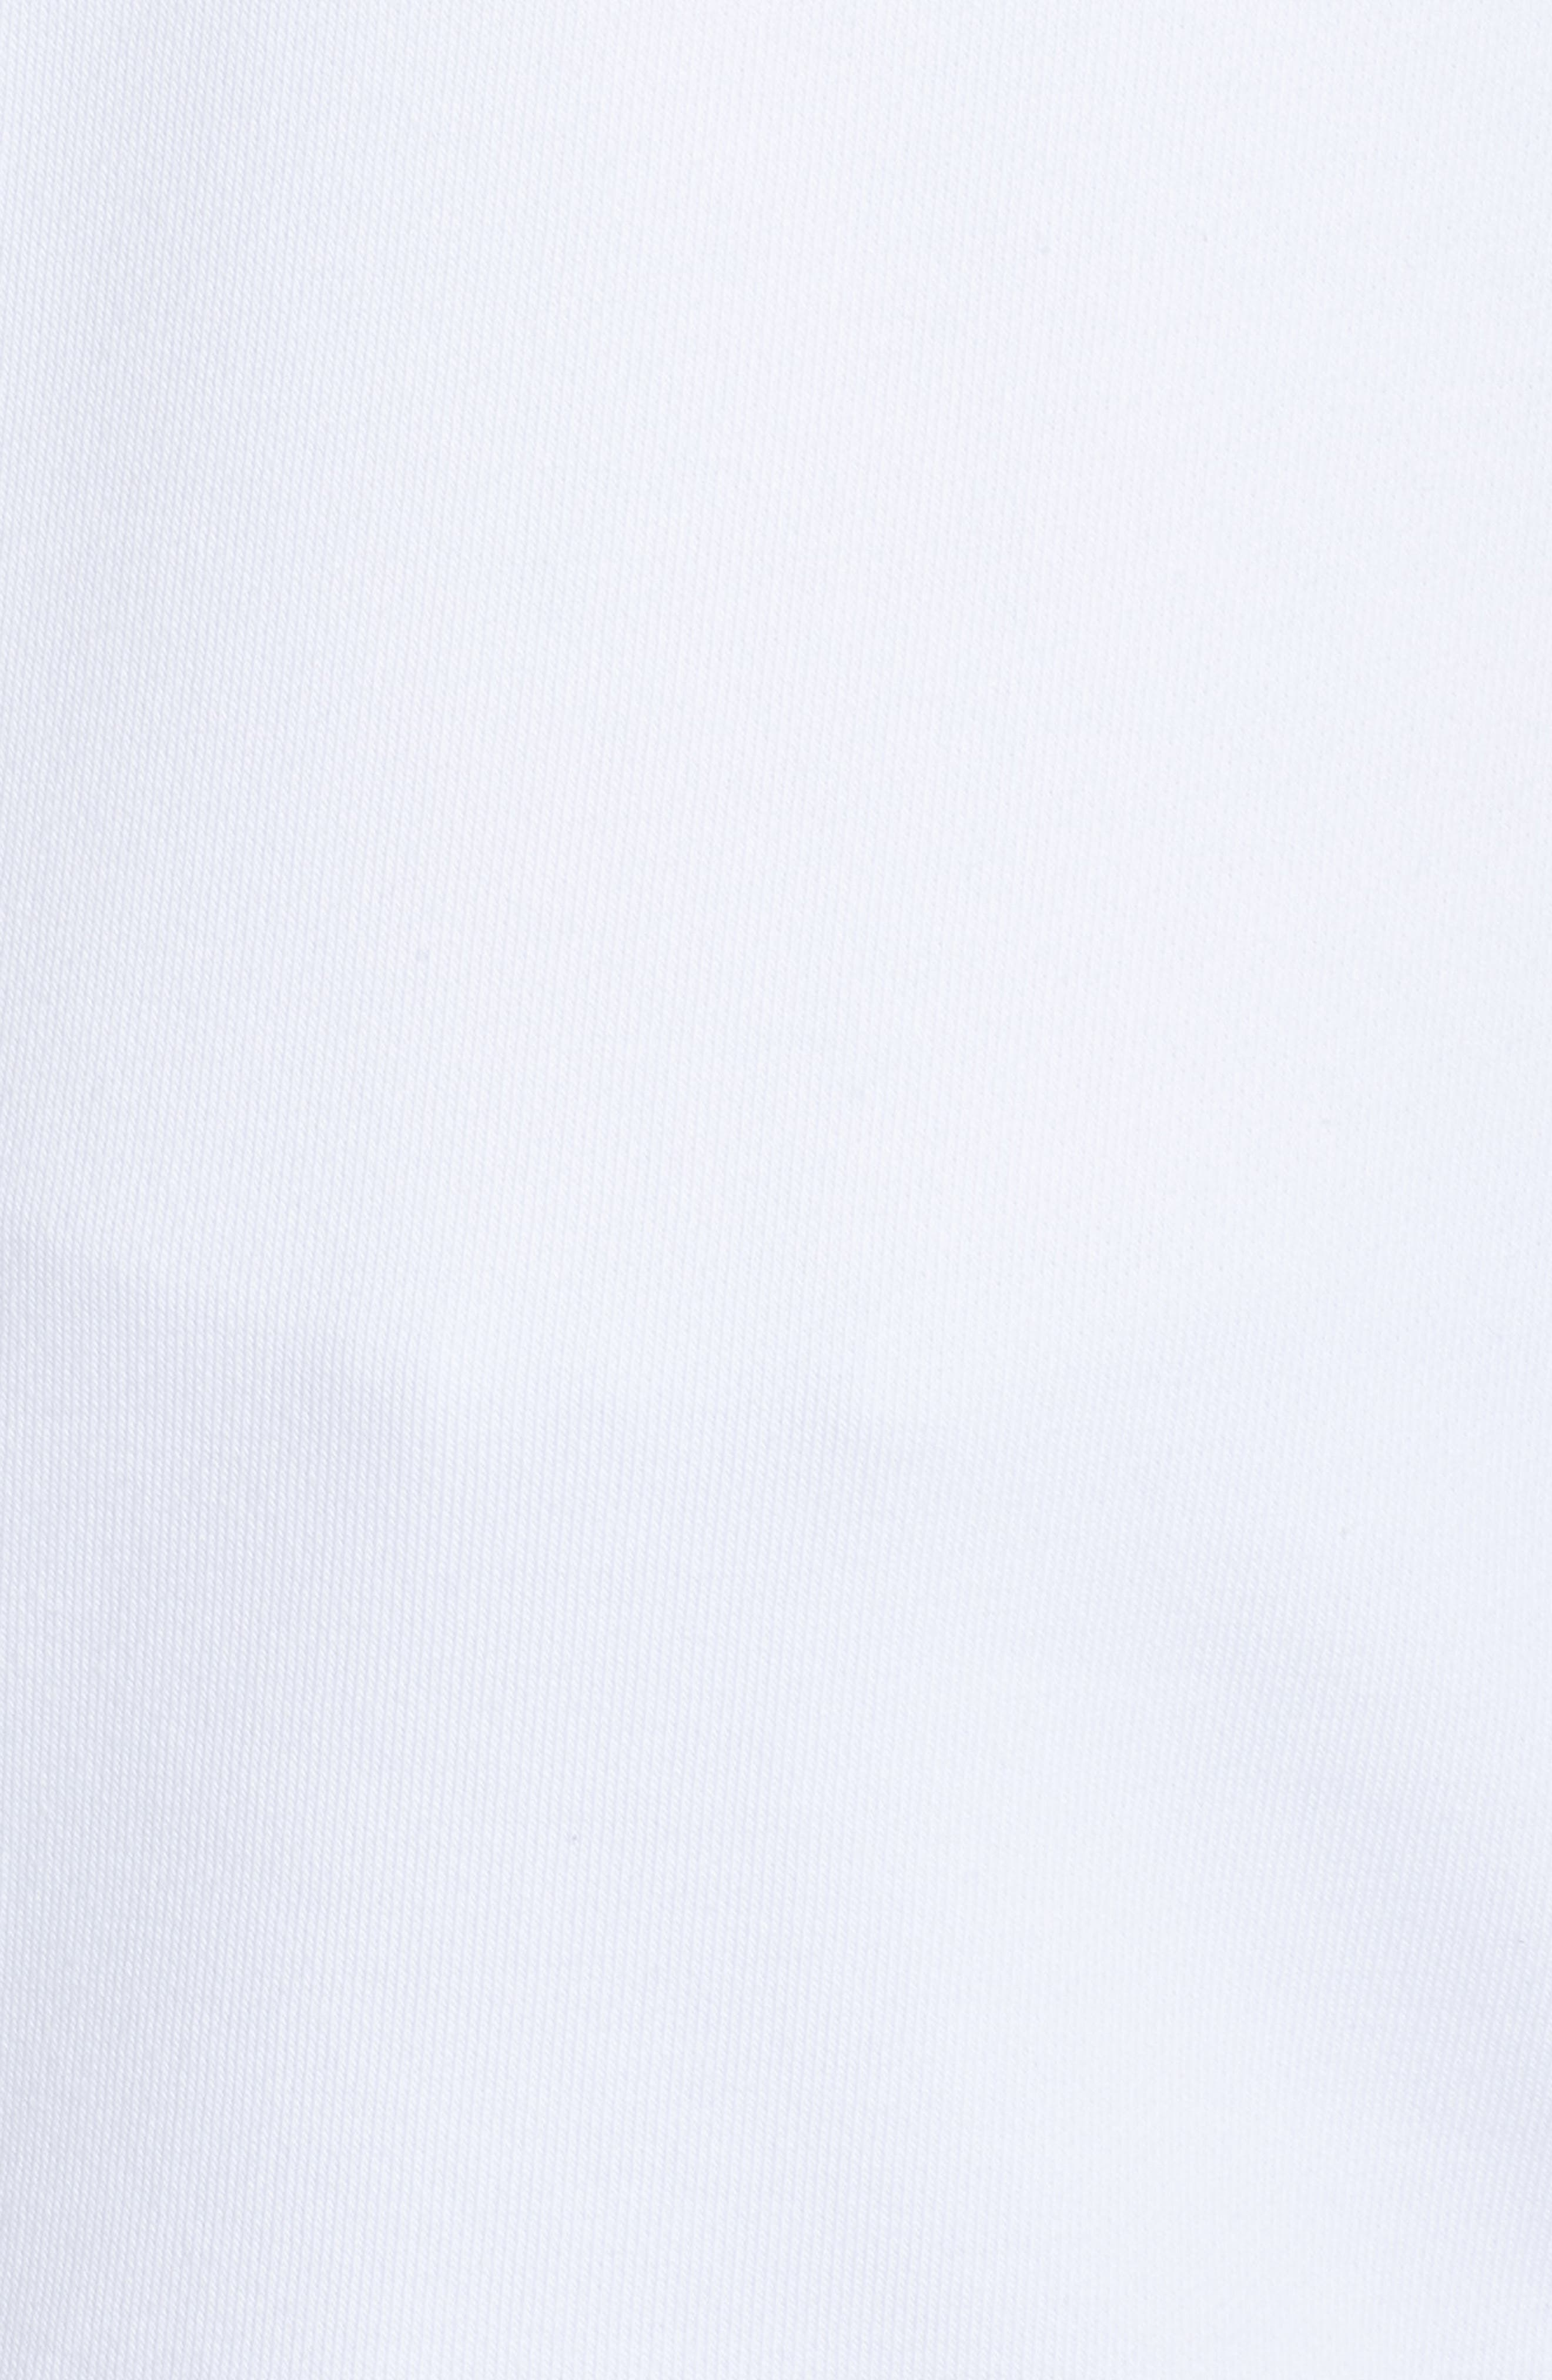 Dry Swoosh Sweatshirt,                             Alternate thumbnail 6, color,                             WHITE/ BLACK HEATHER/ WHITE